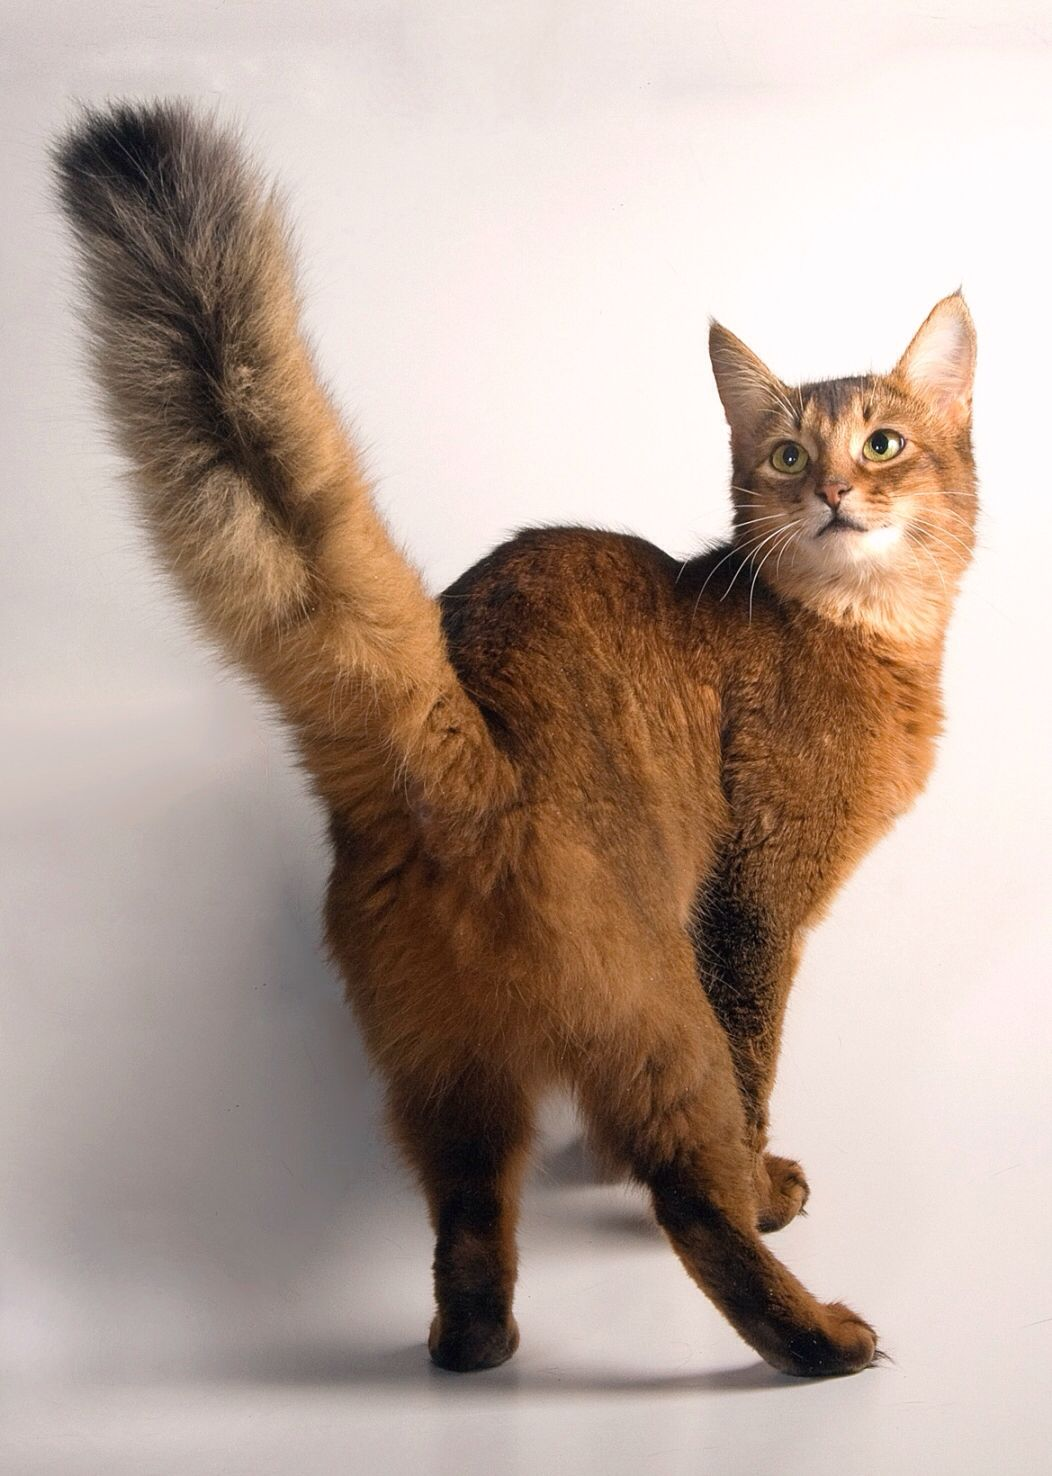 Pin by Matyuhinа Tatiana on Abyssinian cats   Pinterest ...